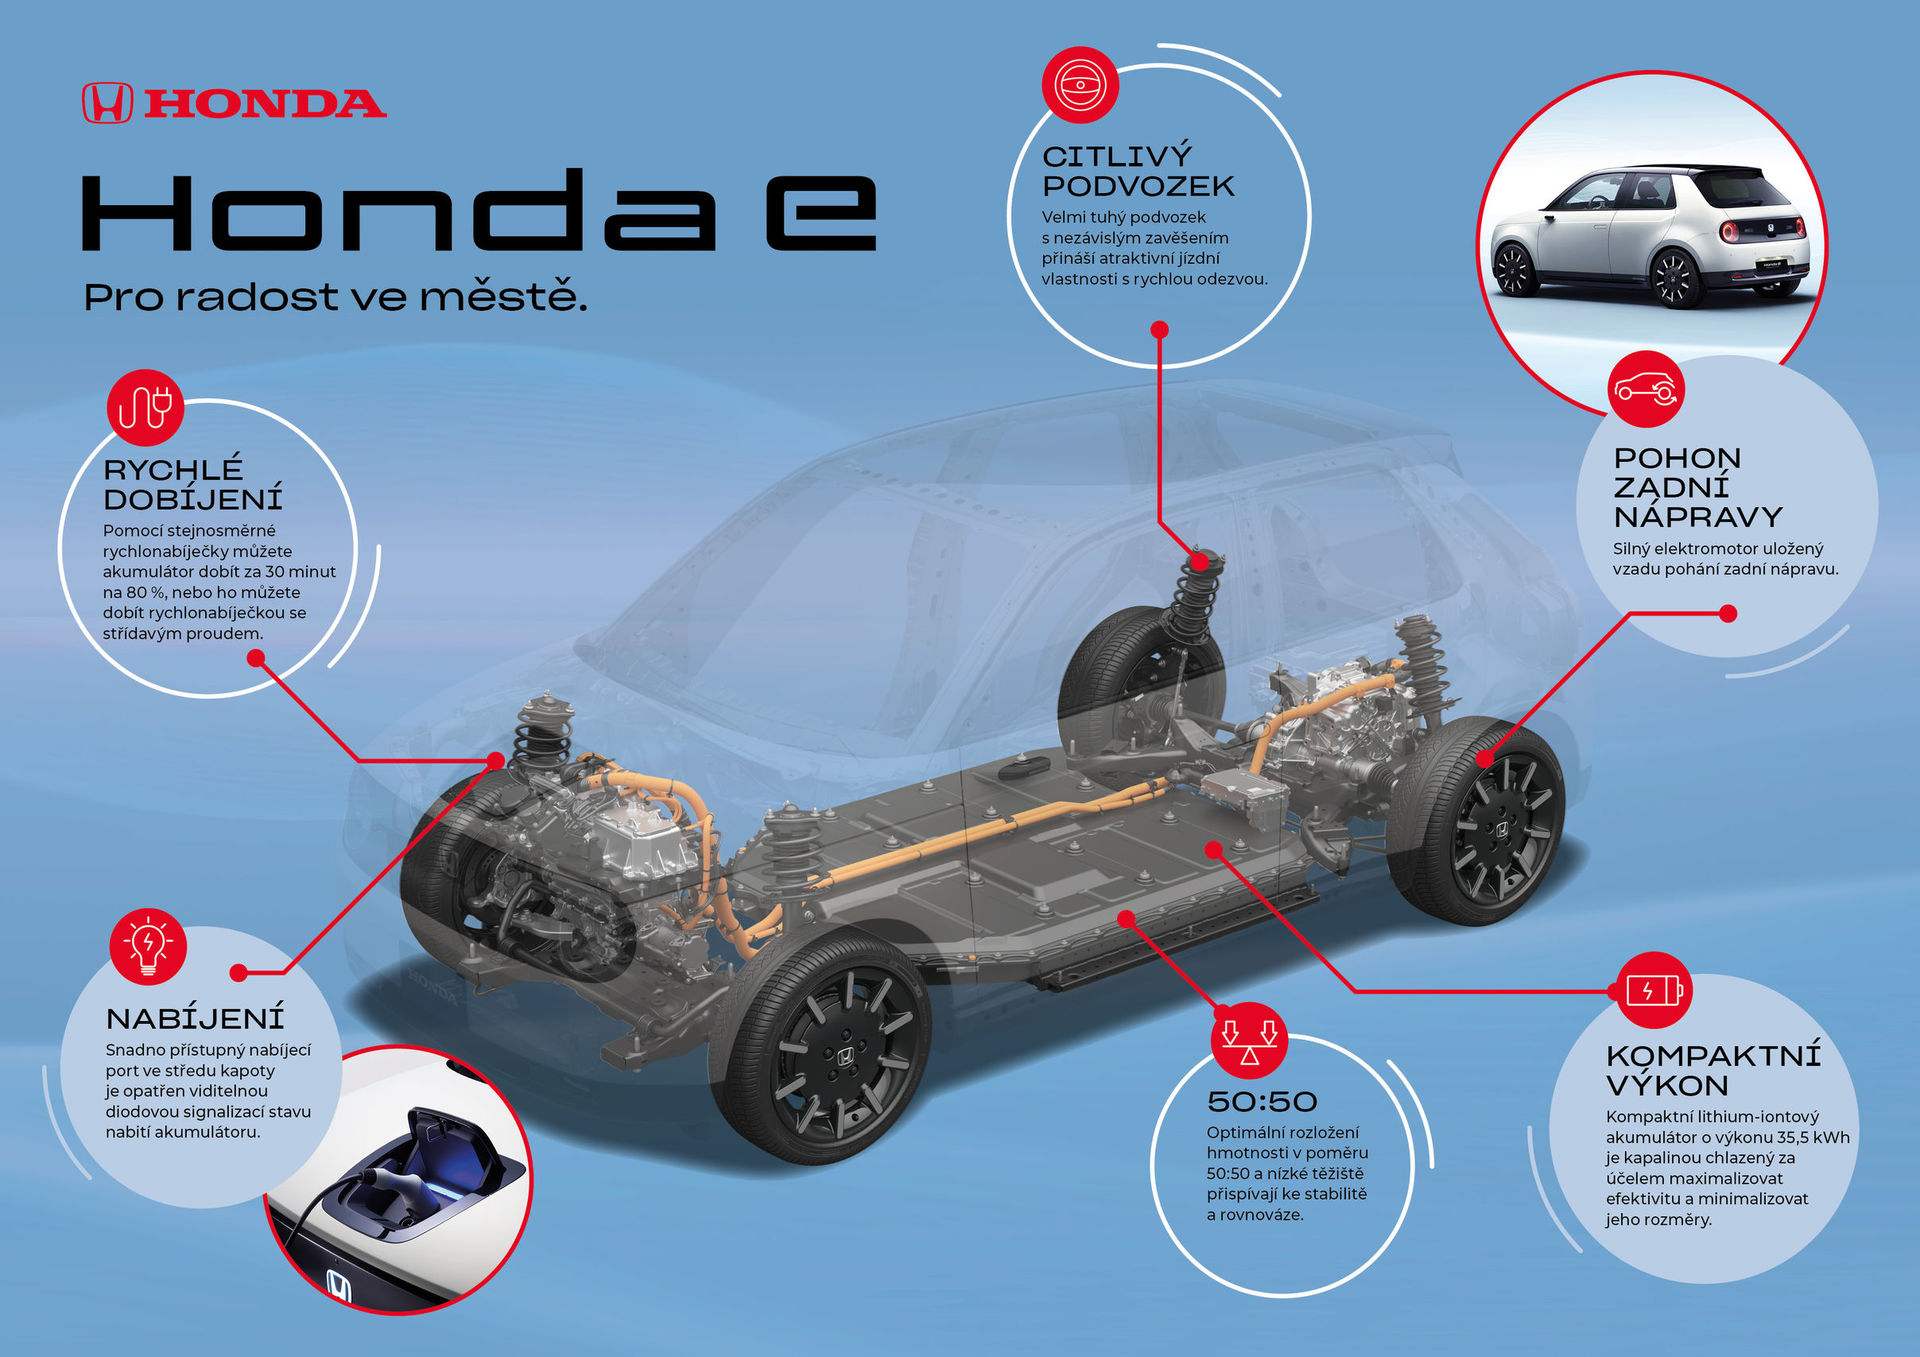 Platforma pro elektromobily automobilky Honda